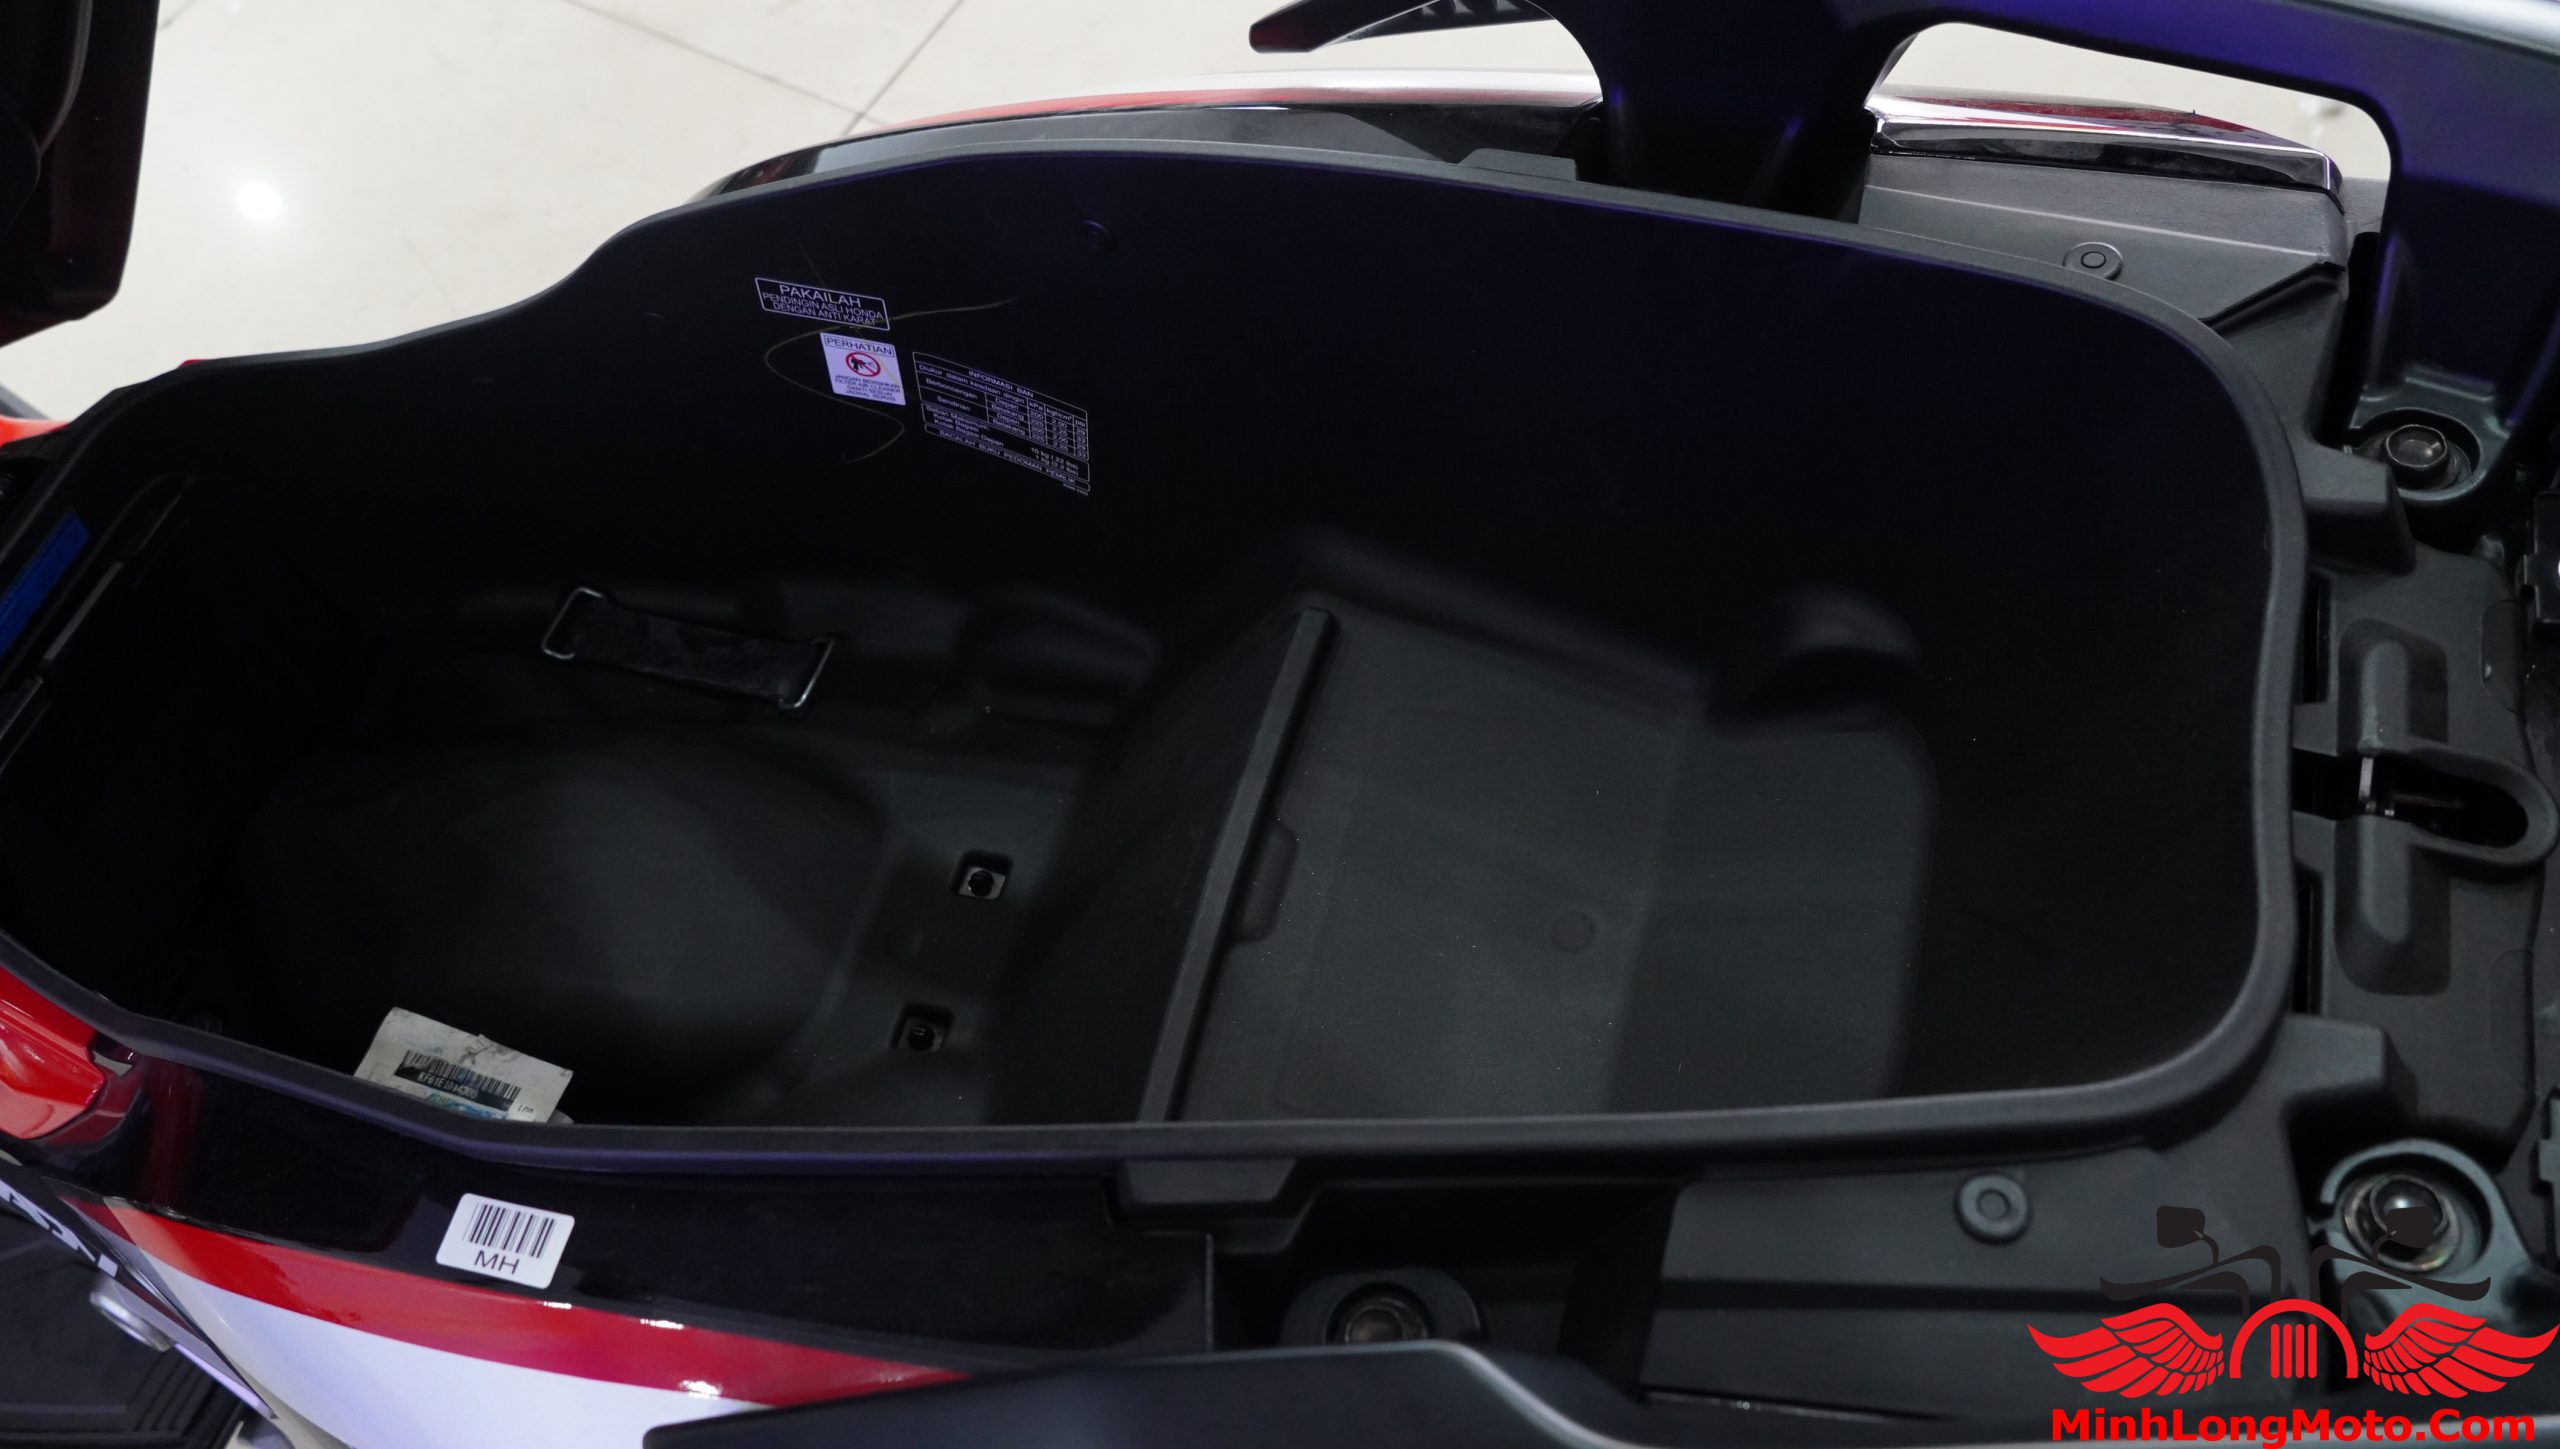 cốp xe Honda ADV 150